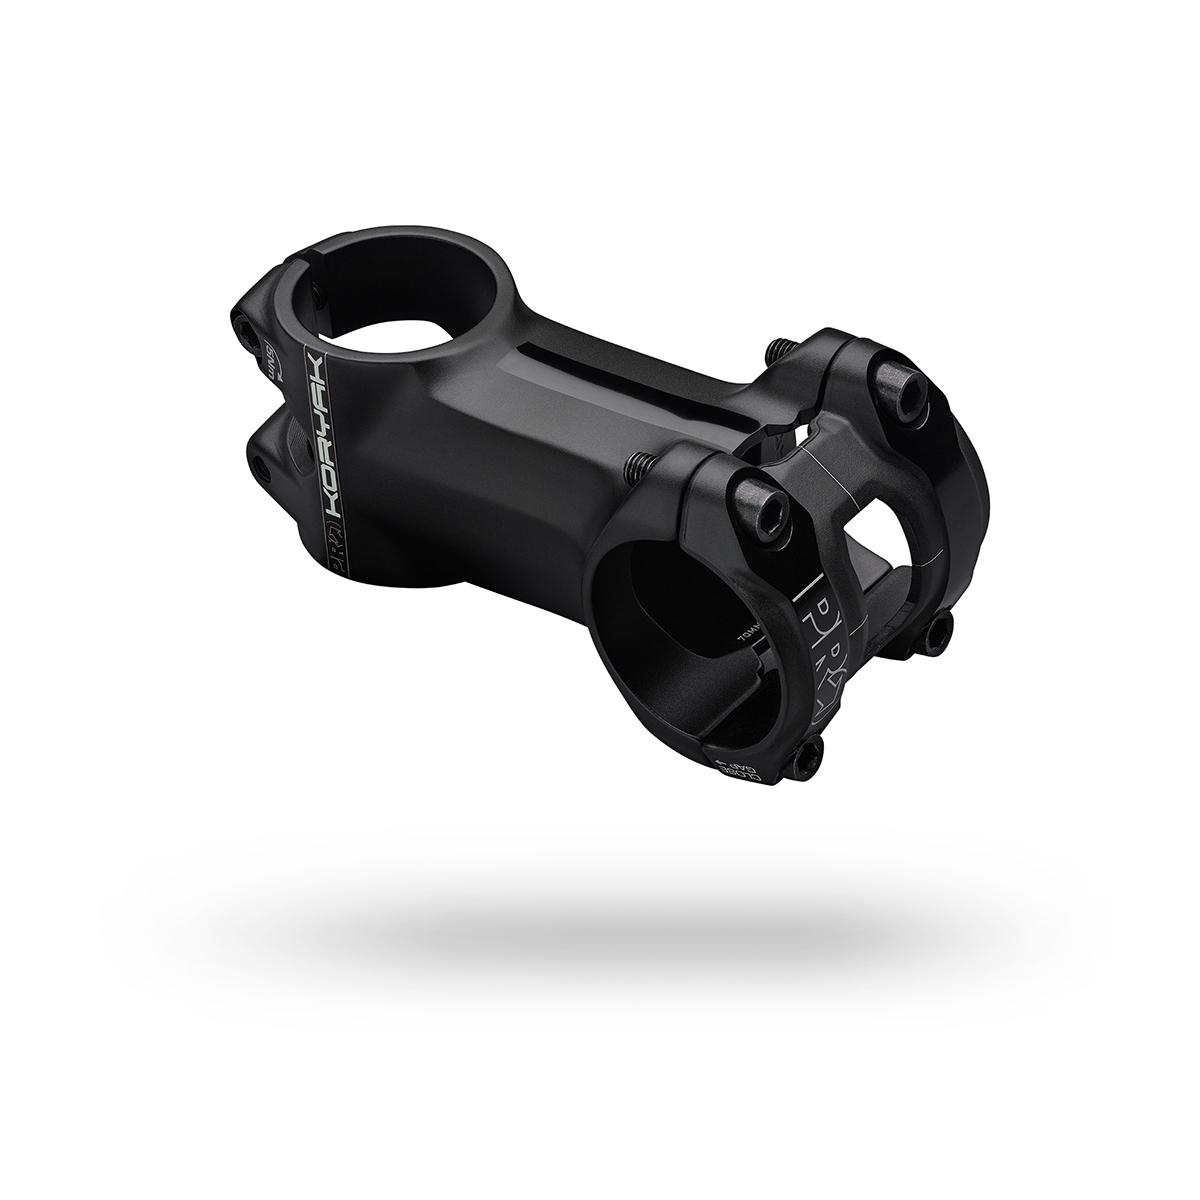 Stem Koryak 31.8mm x 100mm +/-6° Black